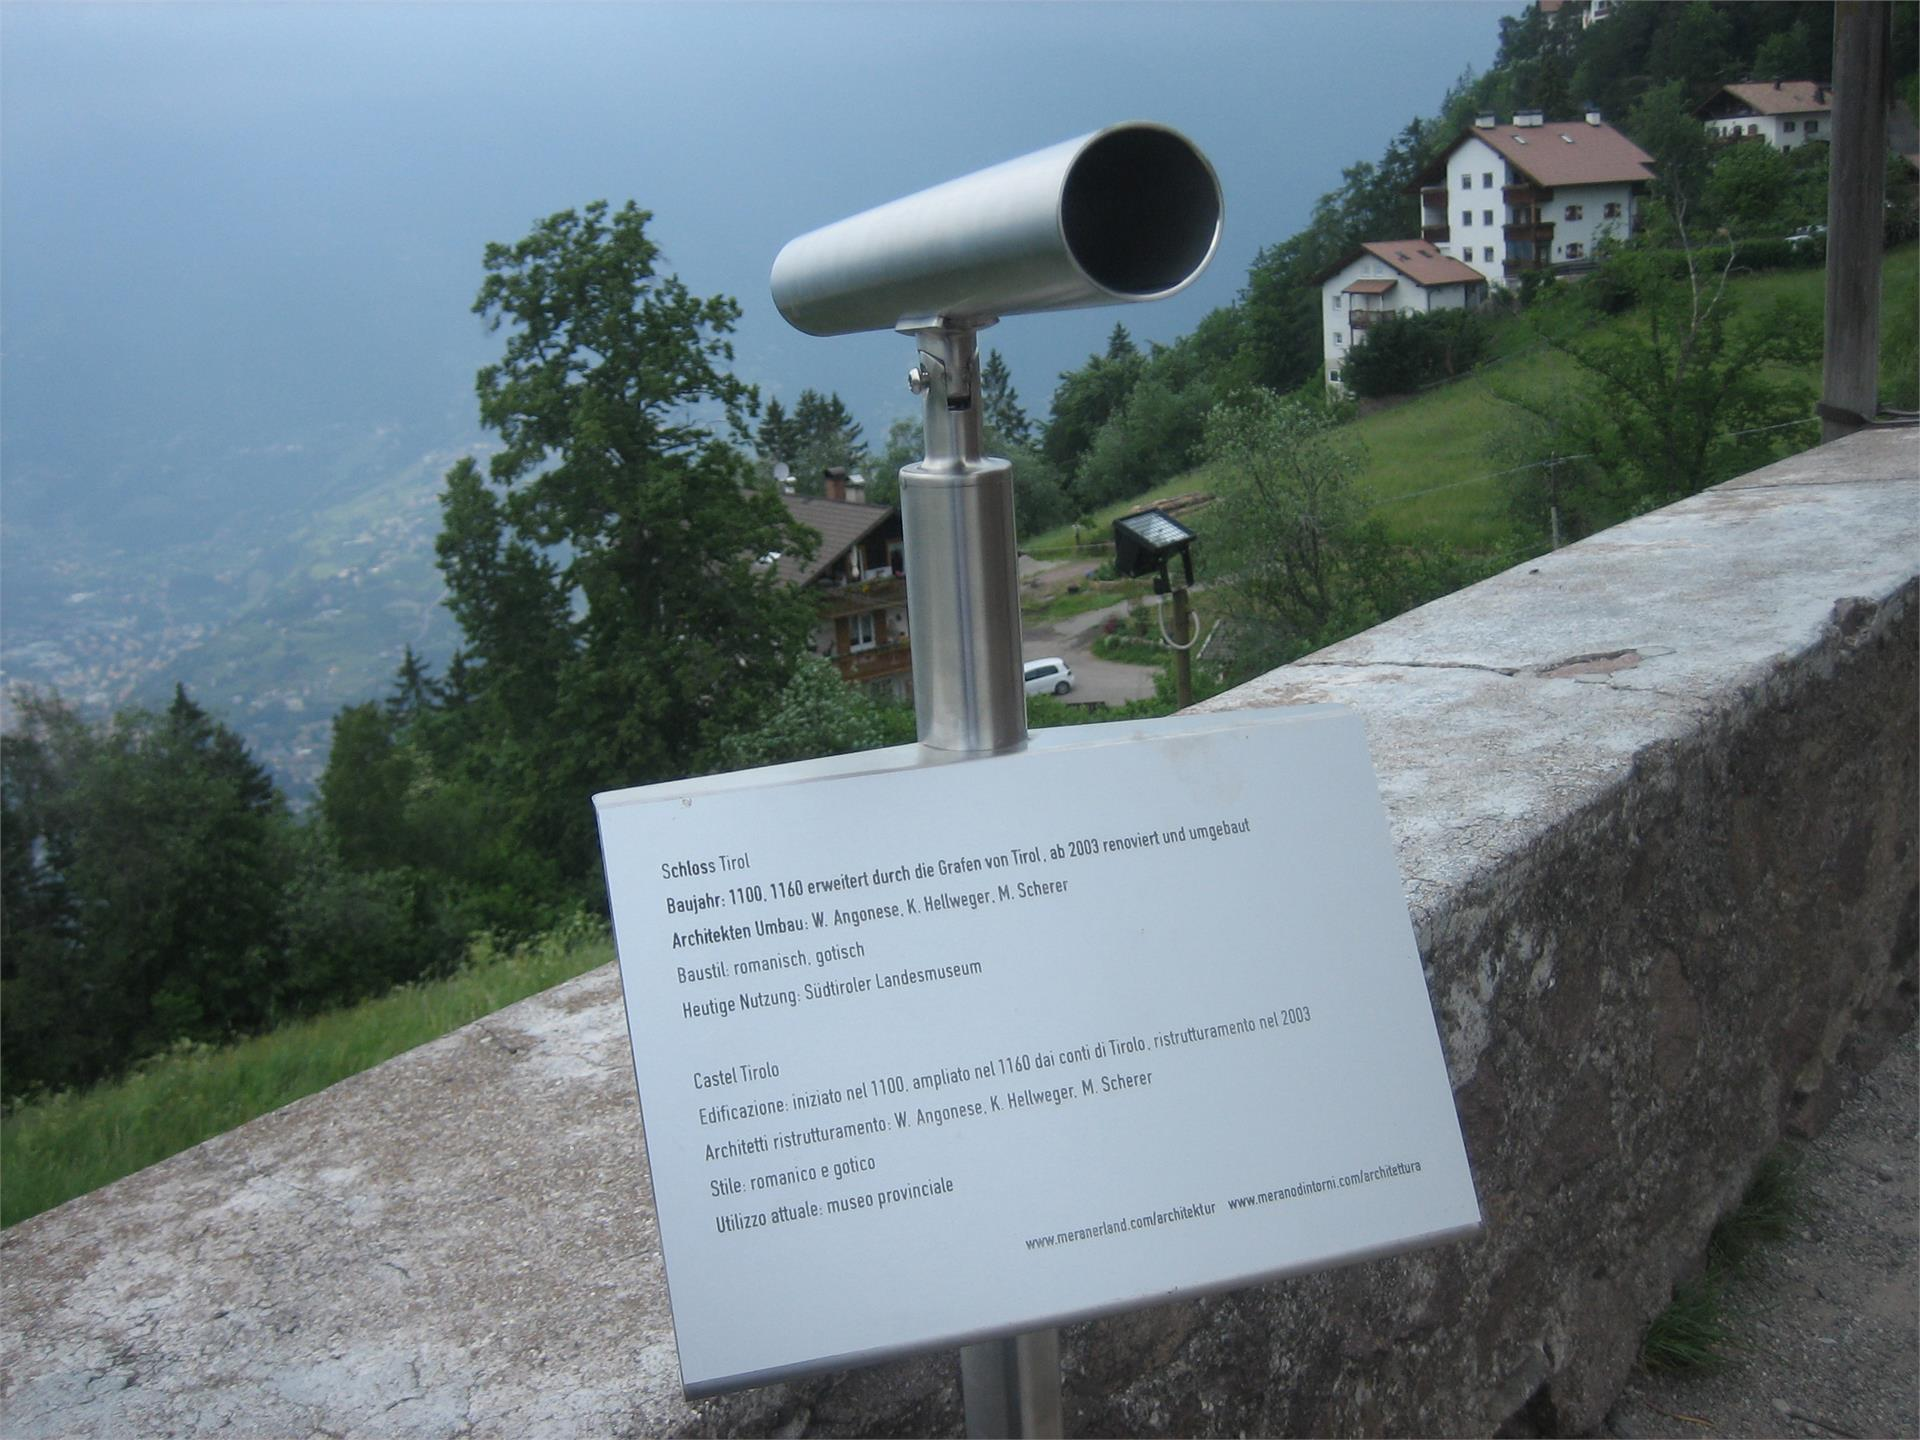 Schloss Tirol - Hingucker St. Kathrein, Hafling